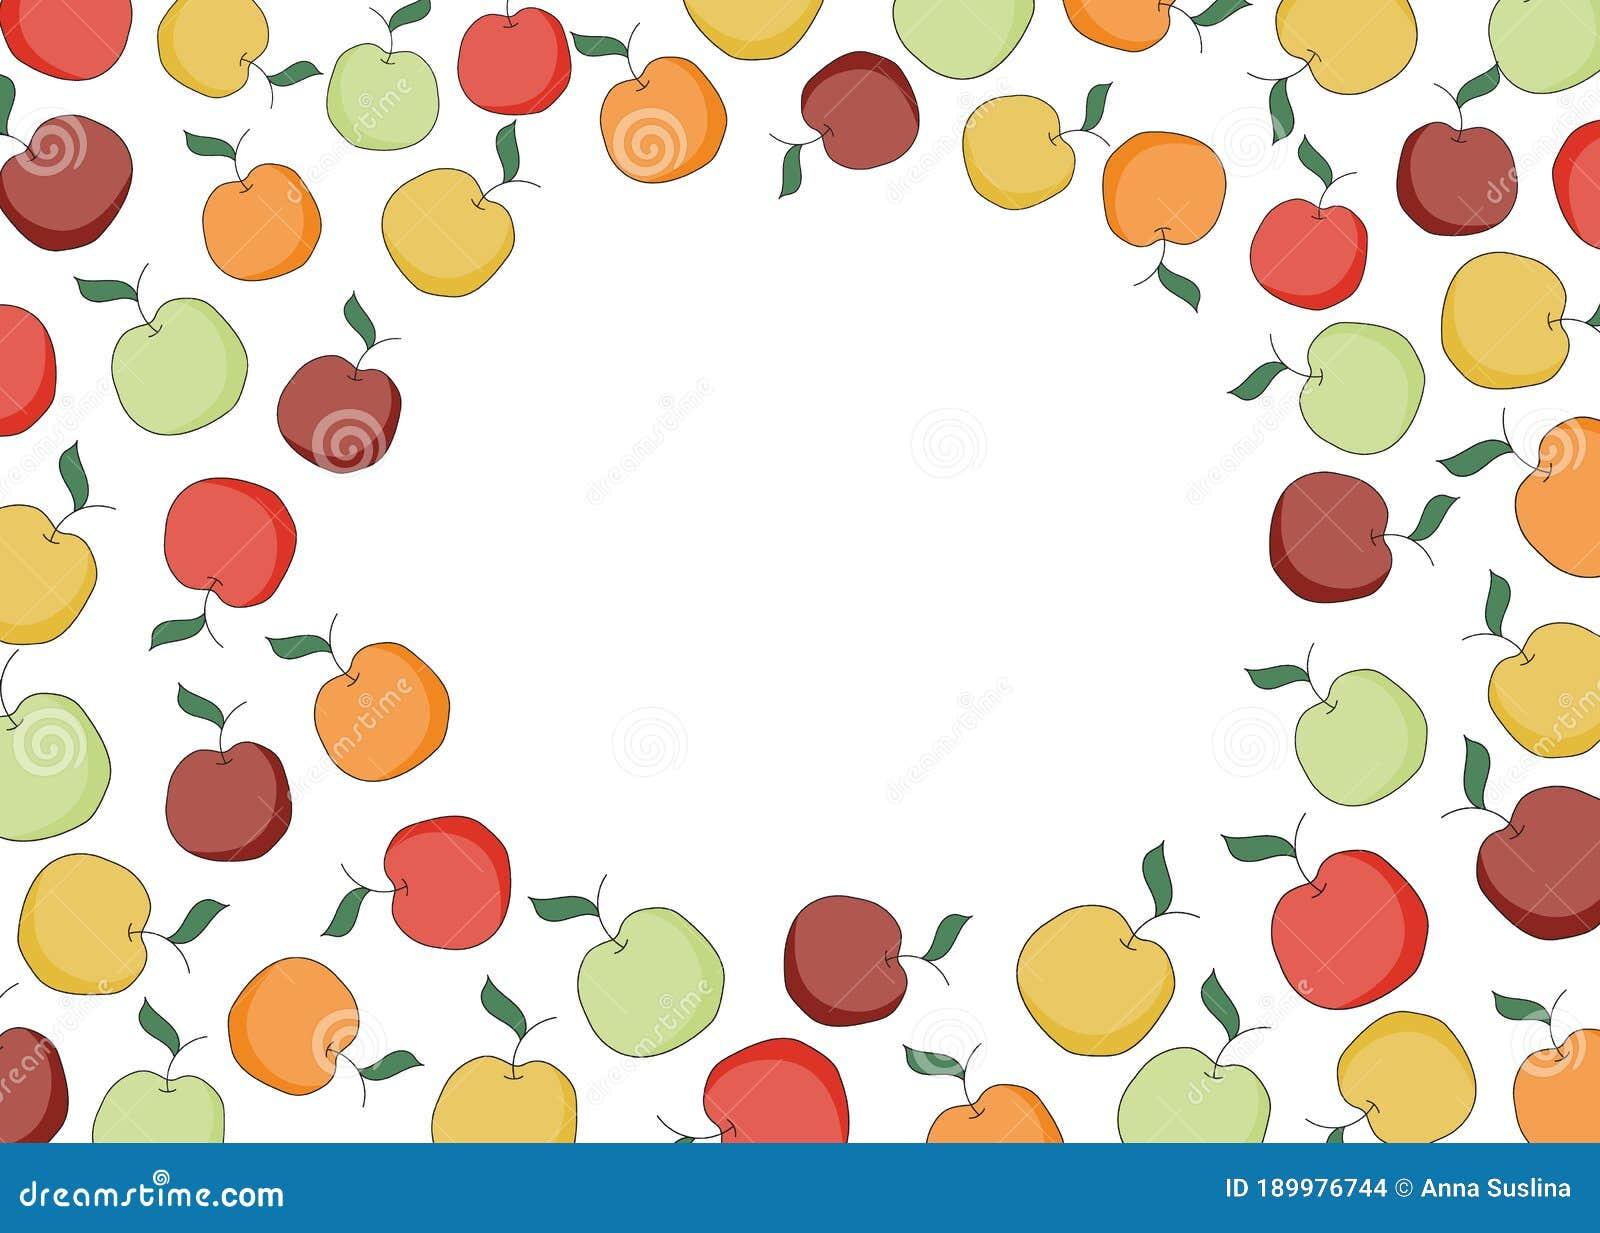 Doodle Cartoon Hipster Style Frame Border Ornament Illustration Red Orange Yellow Green Apples Bar Restaurant Menu Stock Vector Illustration Of Blank Apple 189976744